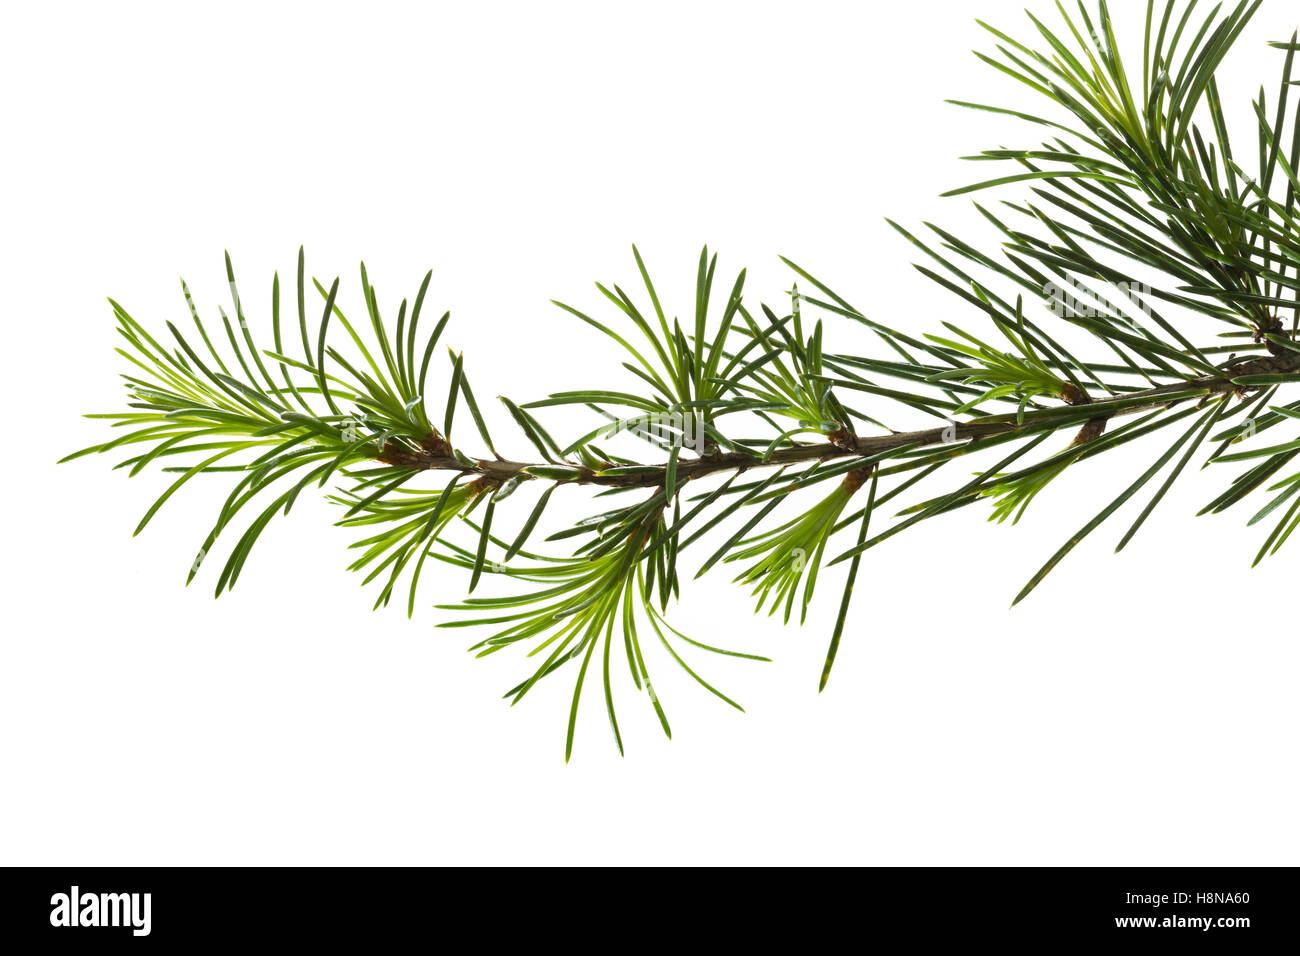 Libanon-Zeder, Libanonzeder, Libanesische Zeder, Cedrus libani, Cedrus libanotica, Lebanon cedar, Cedar of Lebanon, - Stock Image